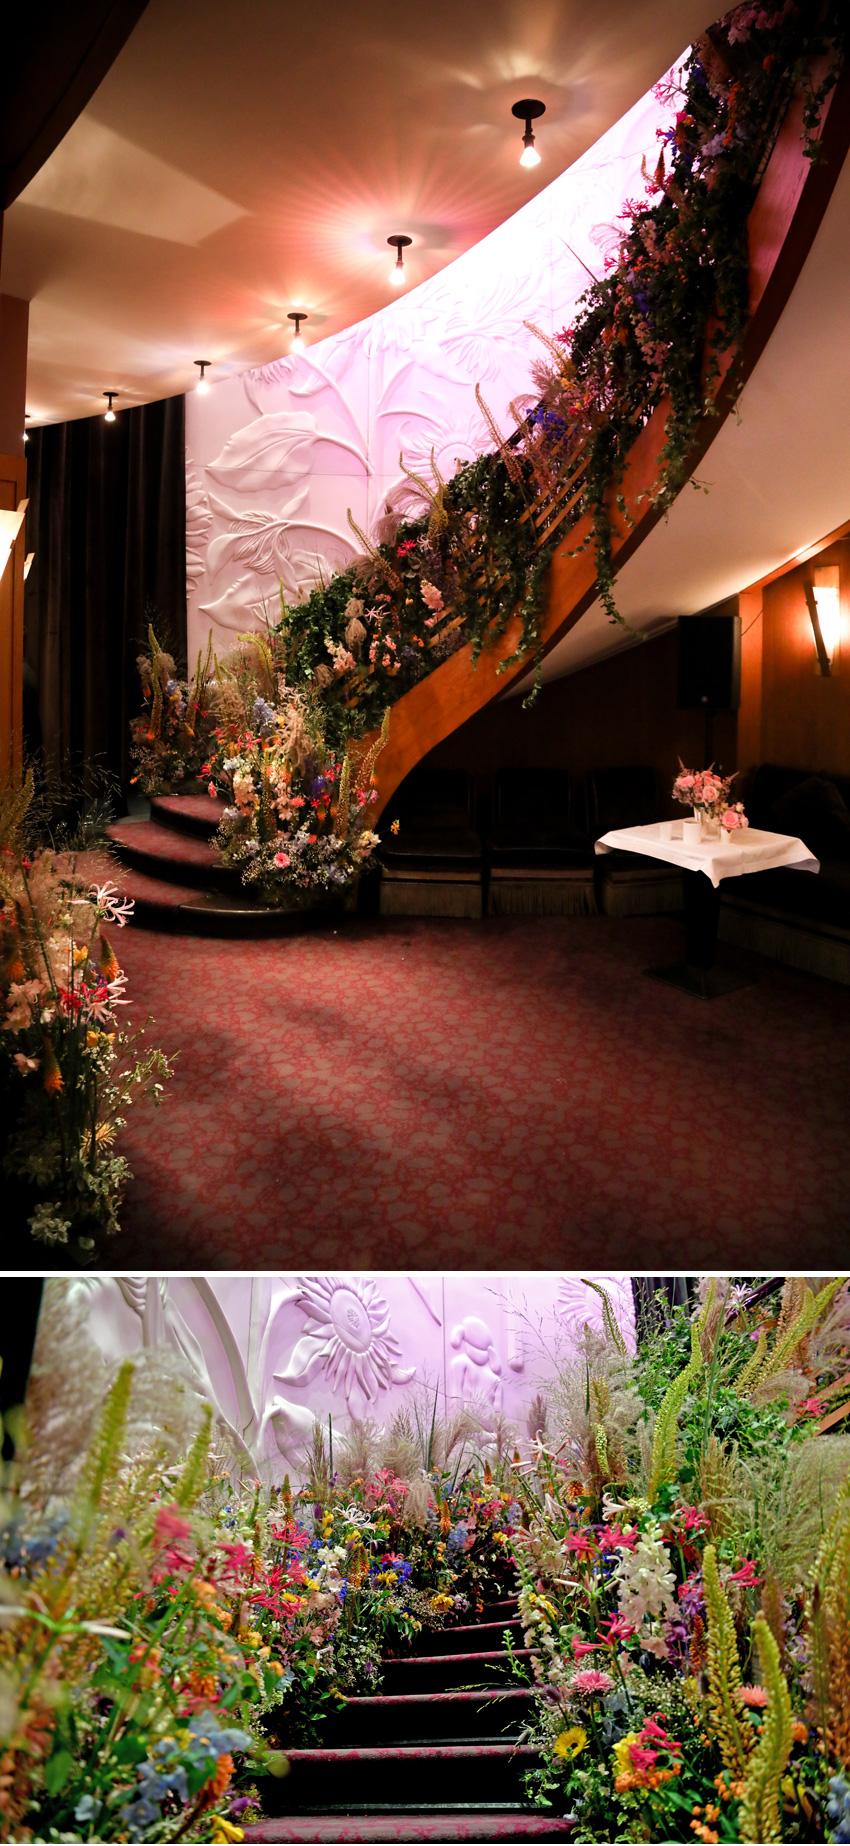 L'Avenue Restaurant in Paris lavish floral decor for Miss Dior Pop-Up